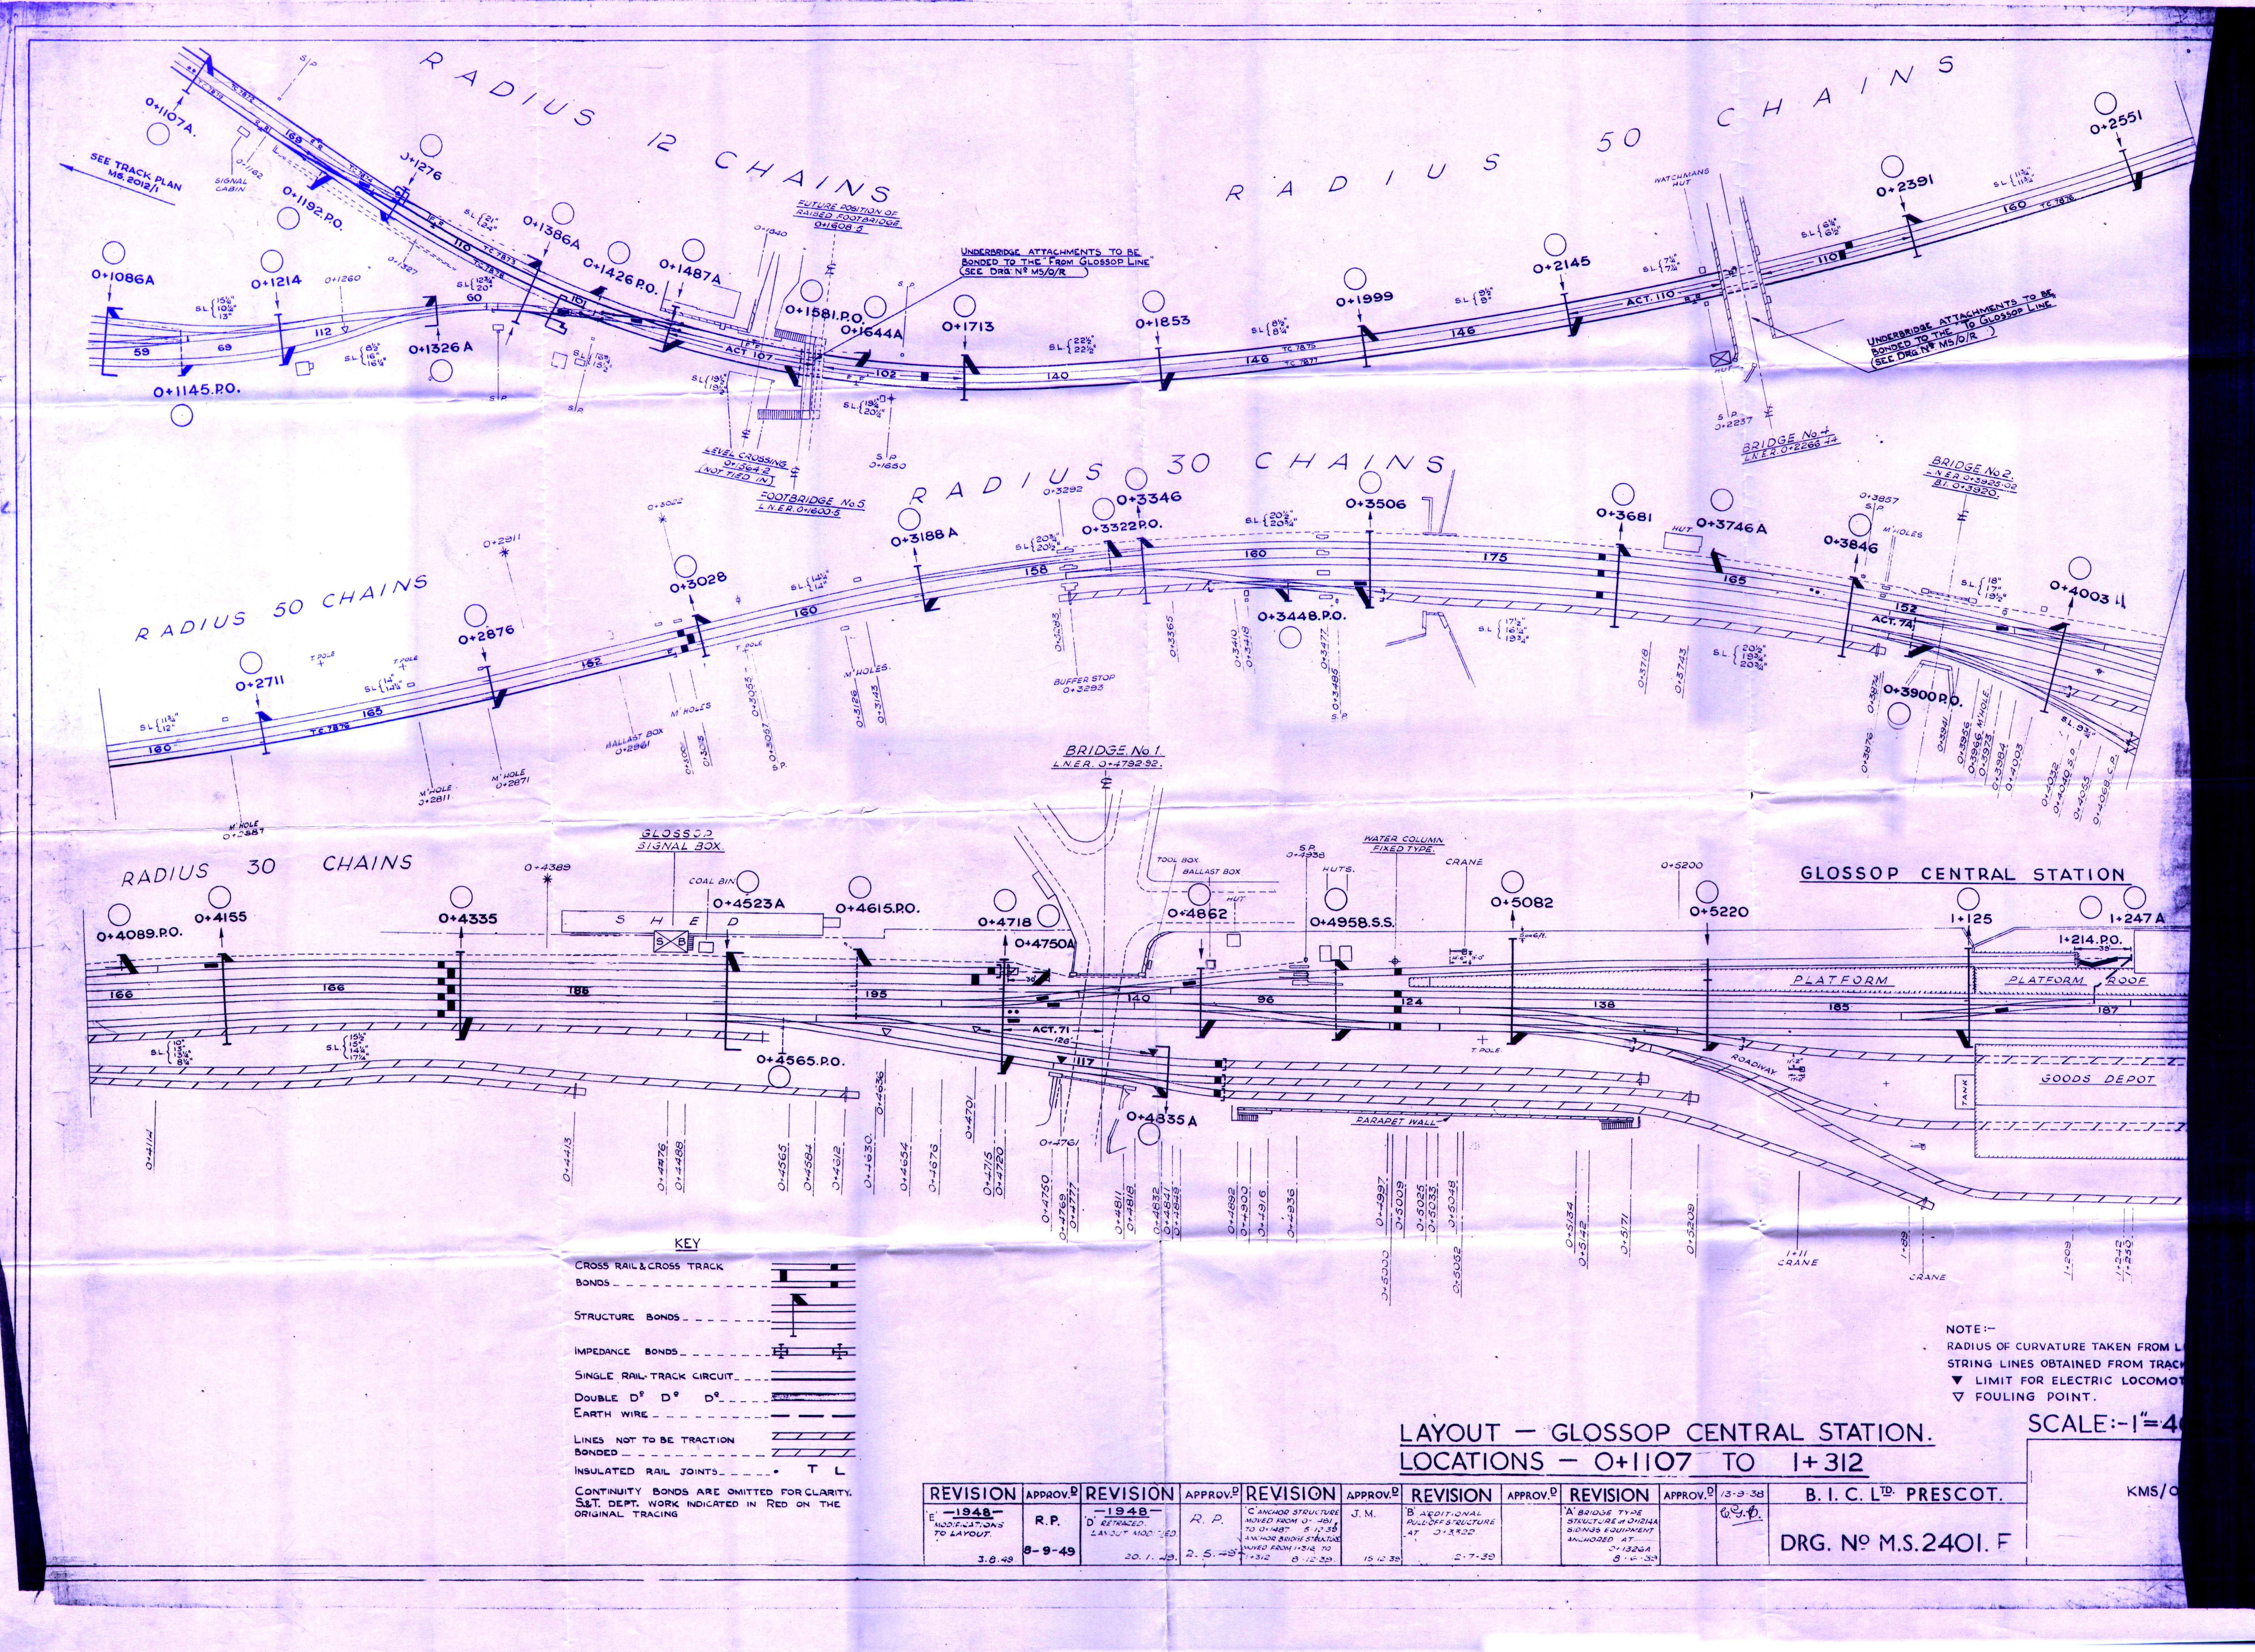 Signal Box Diagrams 1969 Lincoln Wiring Diagram Glossop Branch Electrification